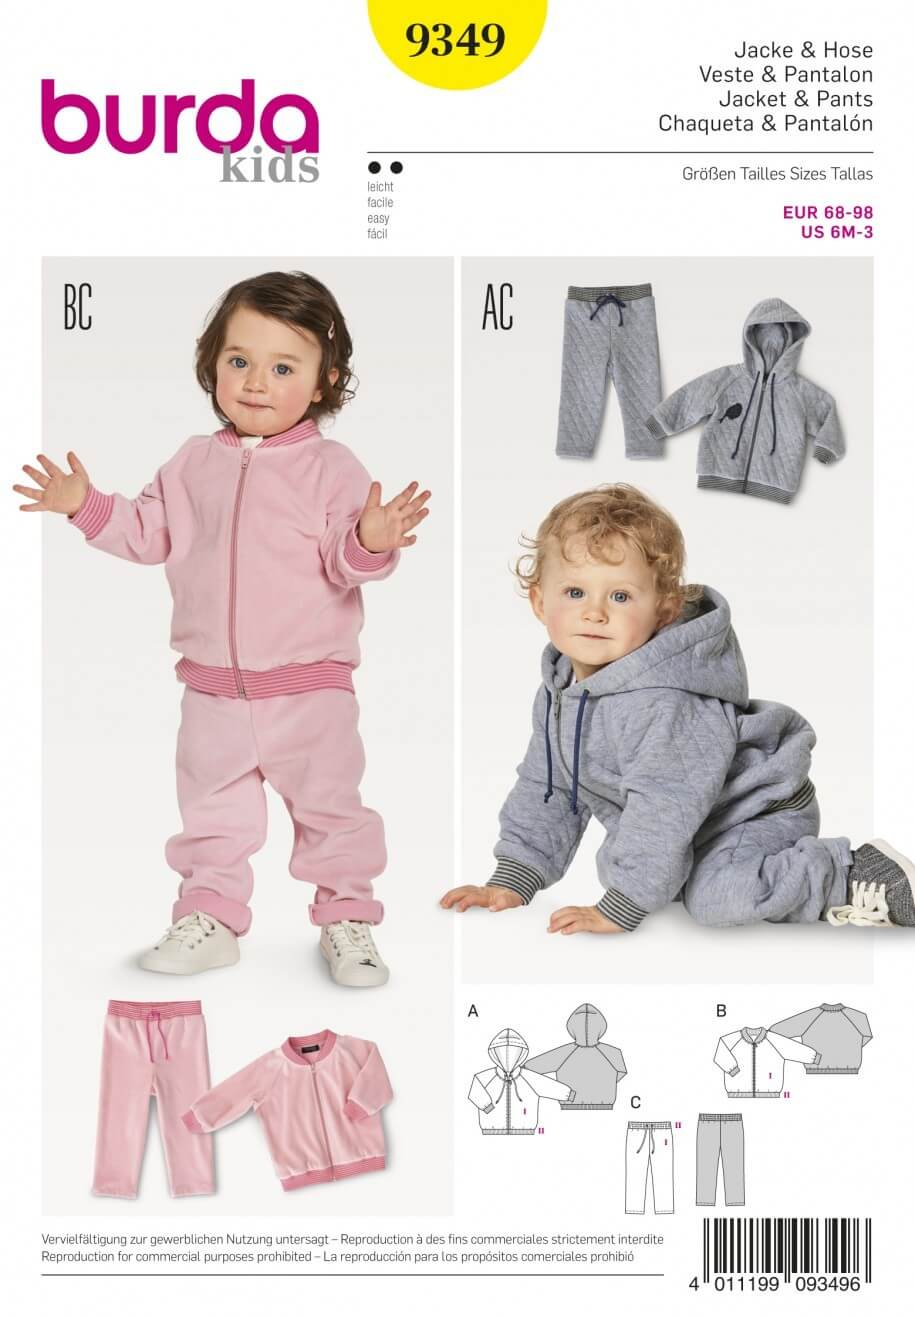 Burda Kids Babies Tracksuit Joggers Jogging Suit Sewing Pattern 9349